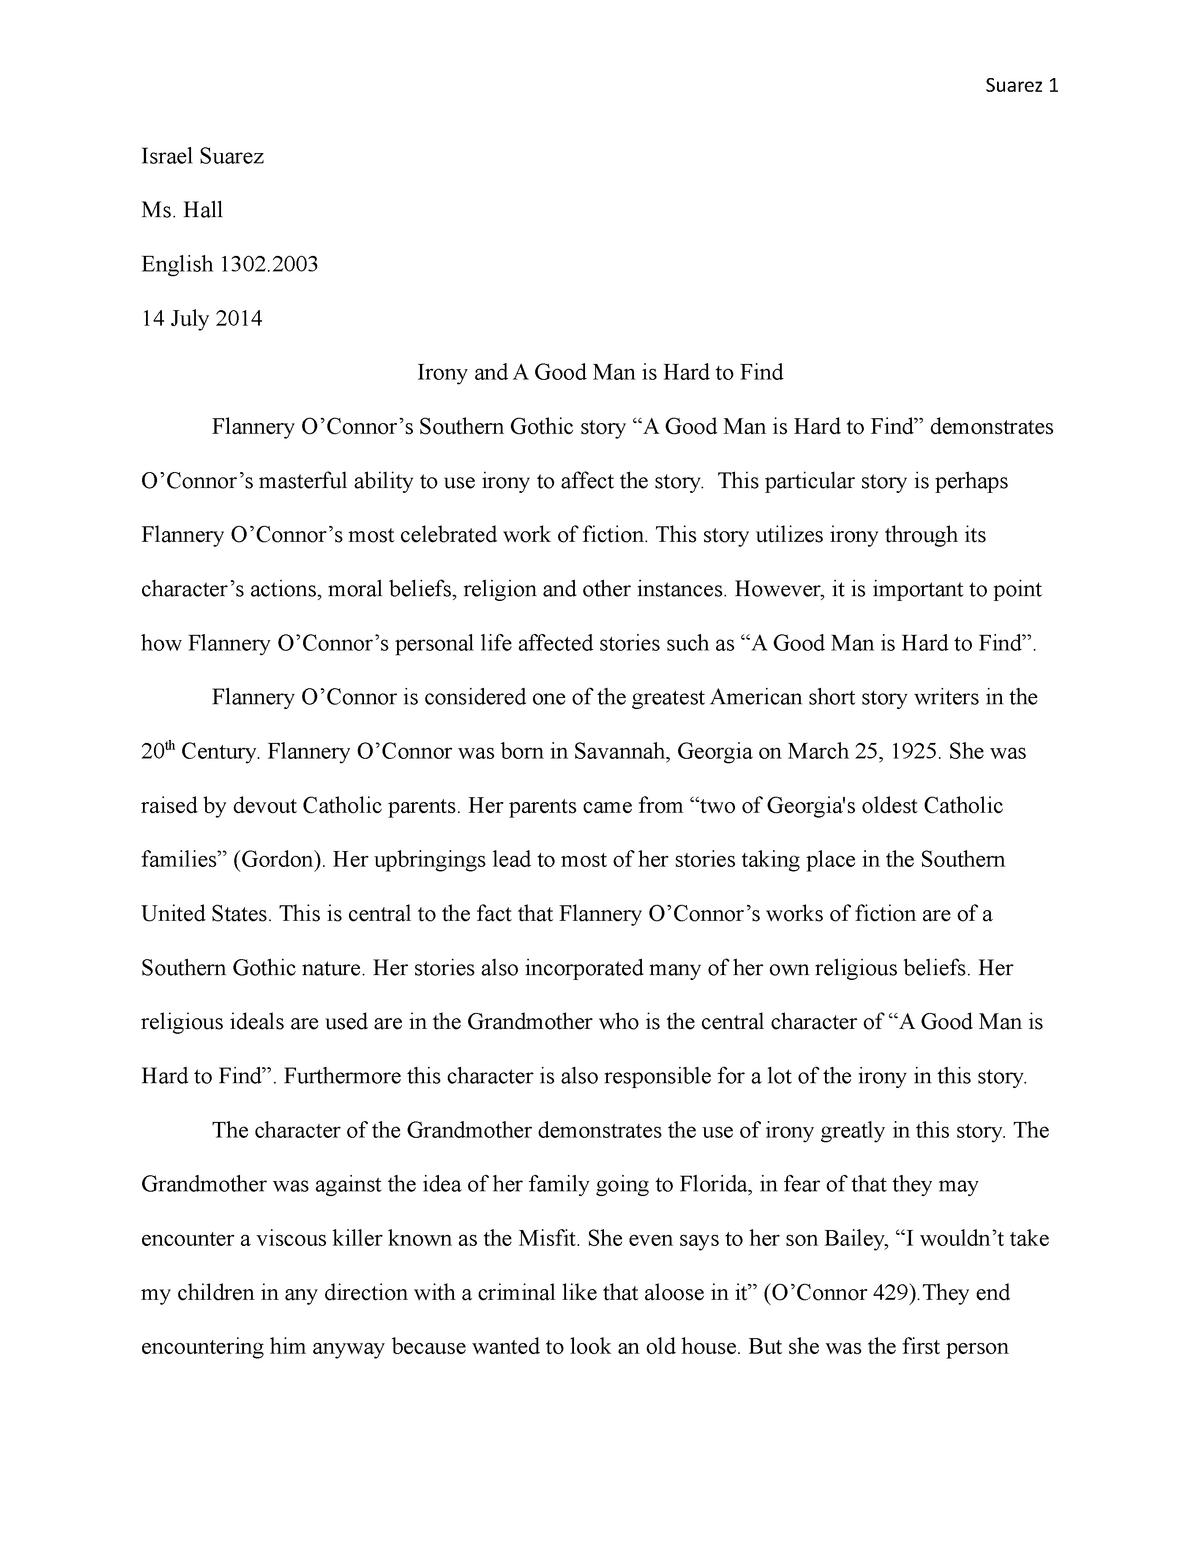 Comp 2 Research Paper - Grade: b - ENGL1302: Rhetoric